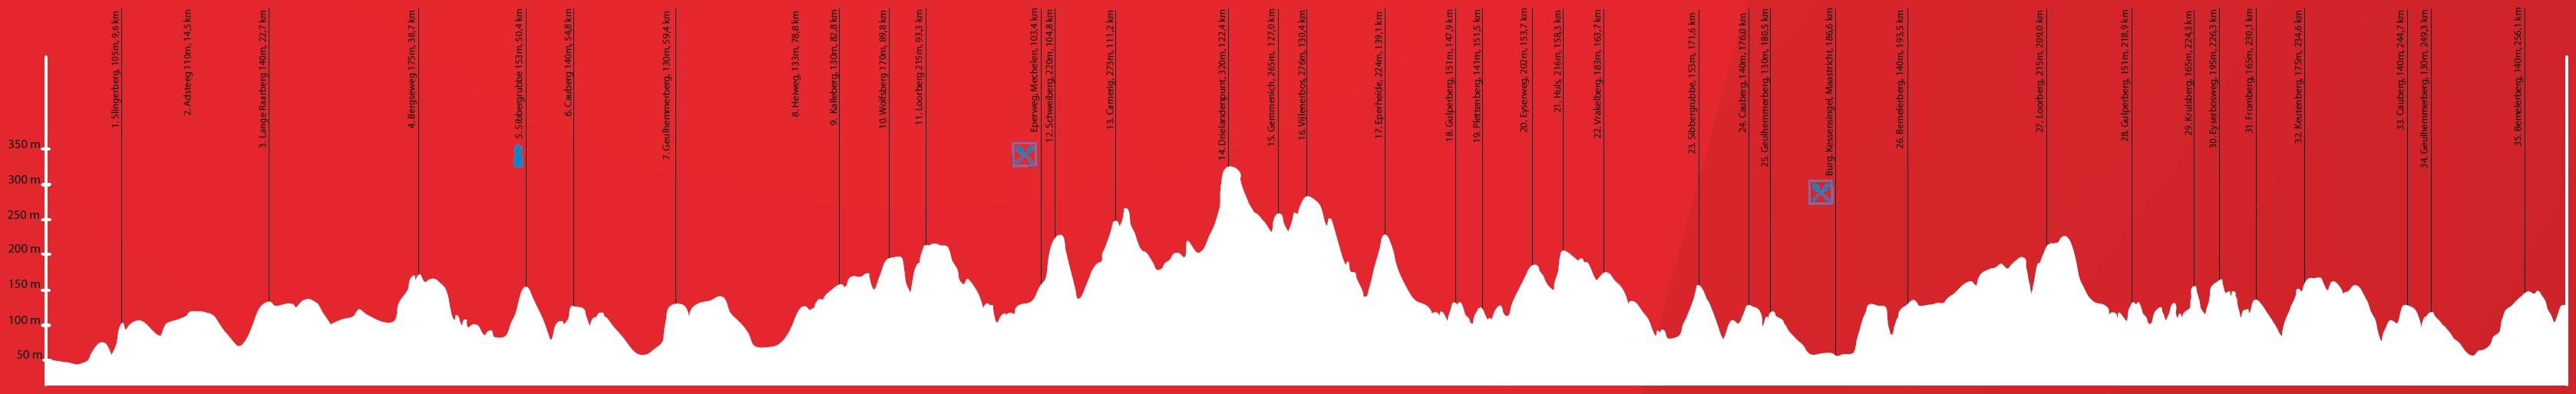 Höhenprofil Amstel Gold Race 2018